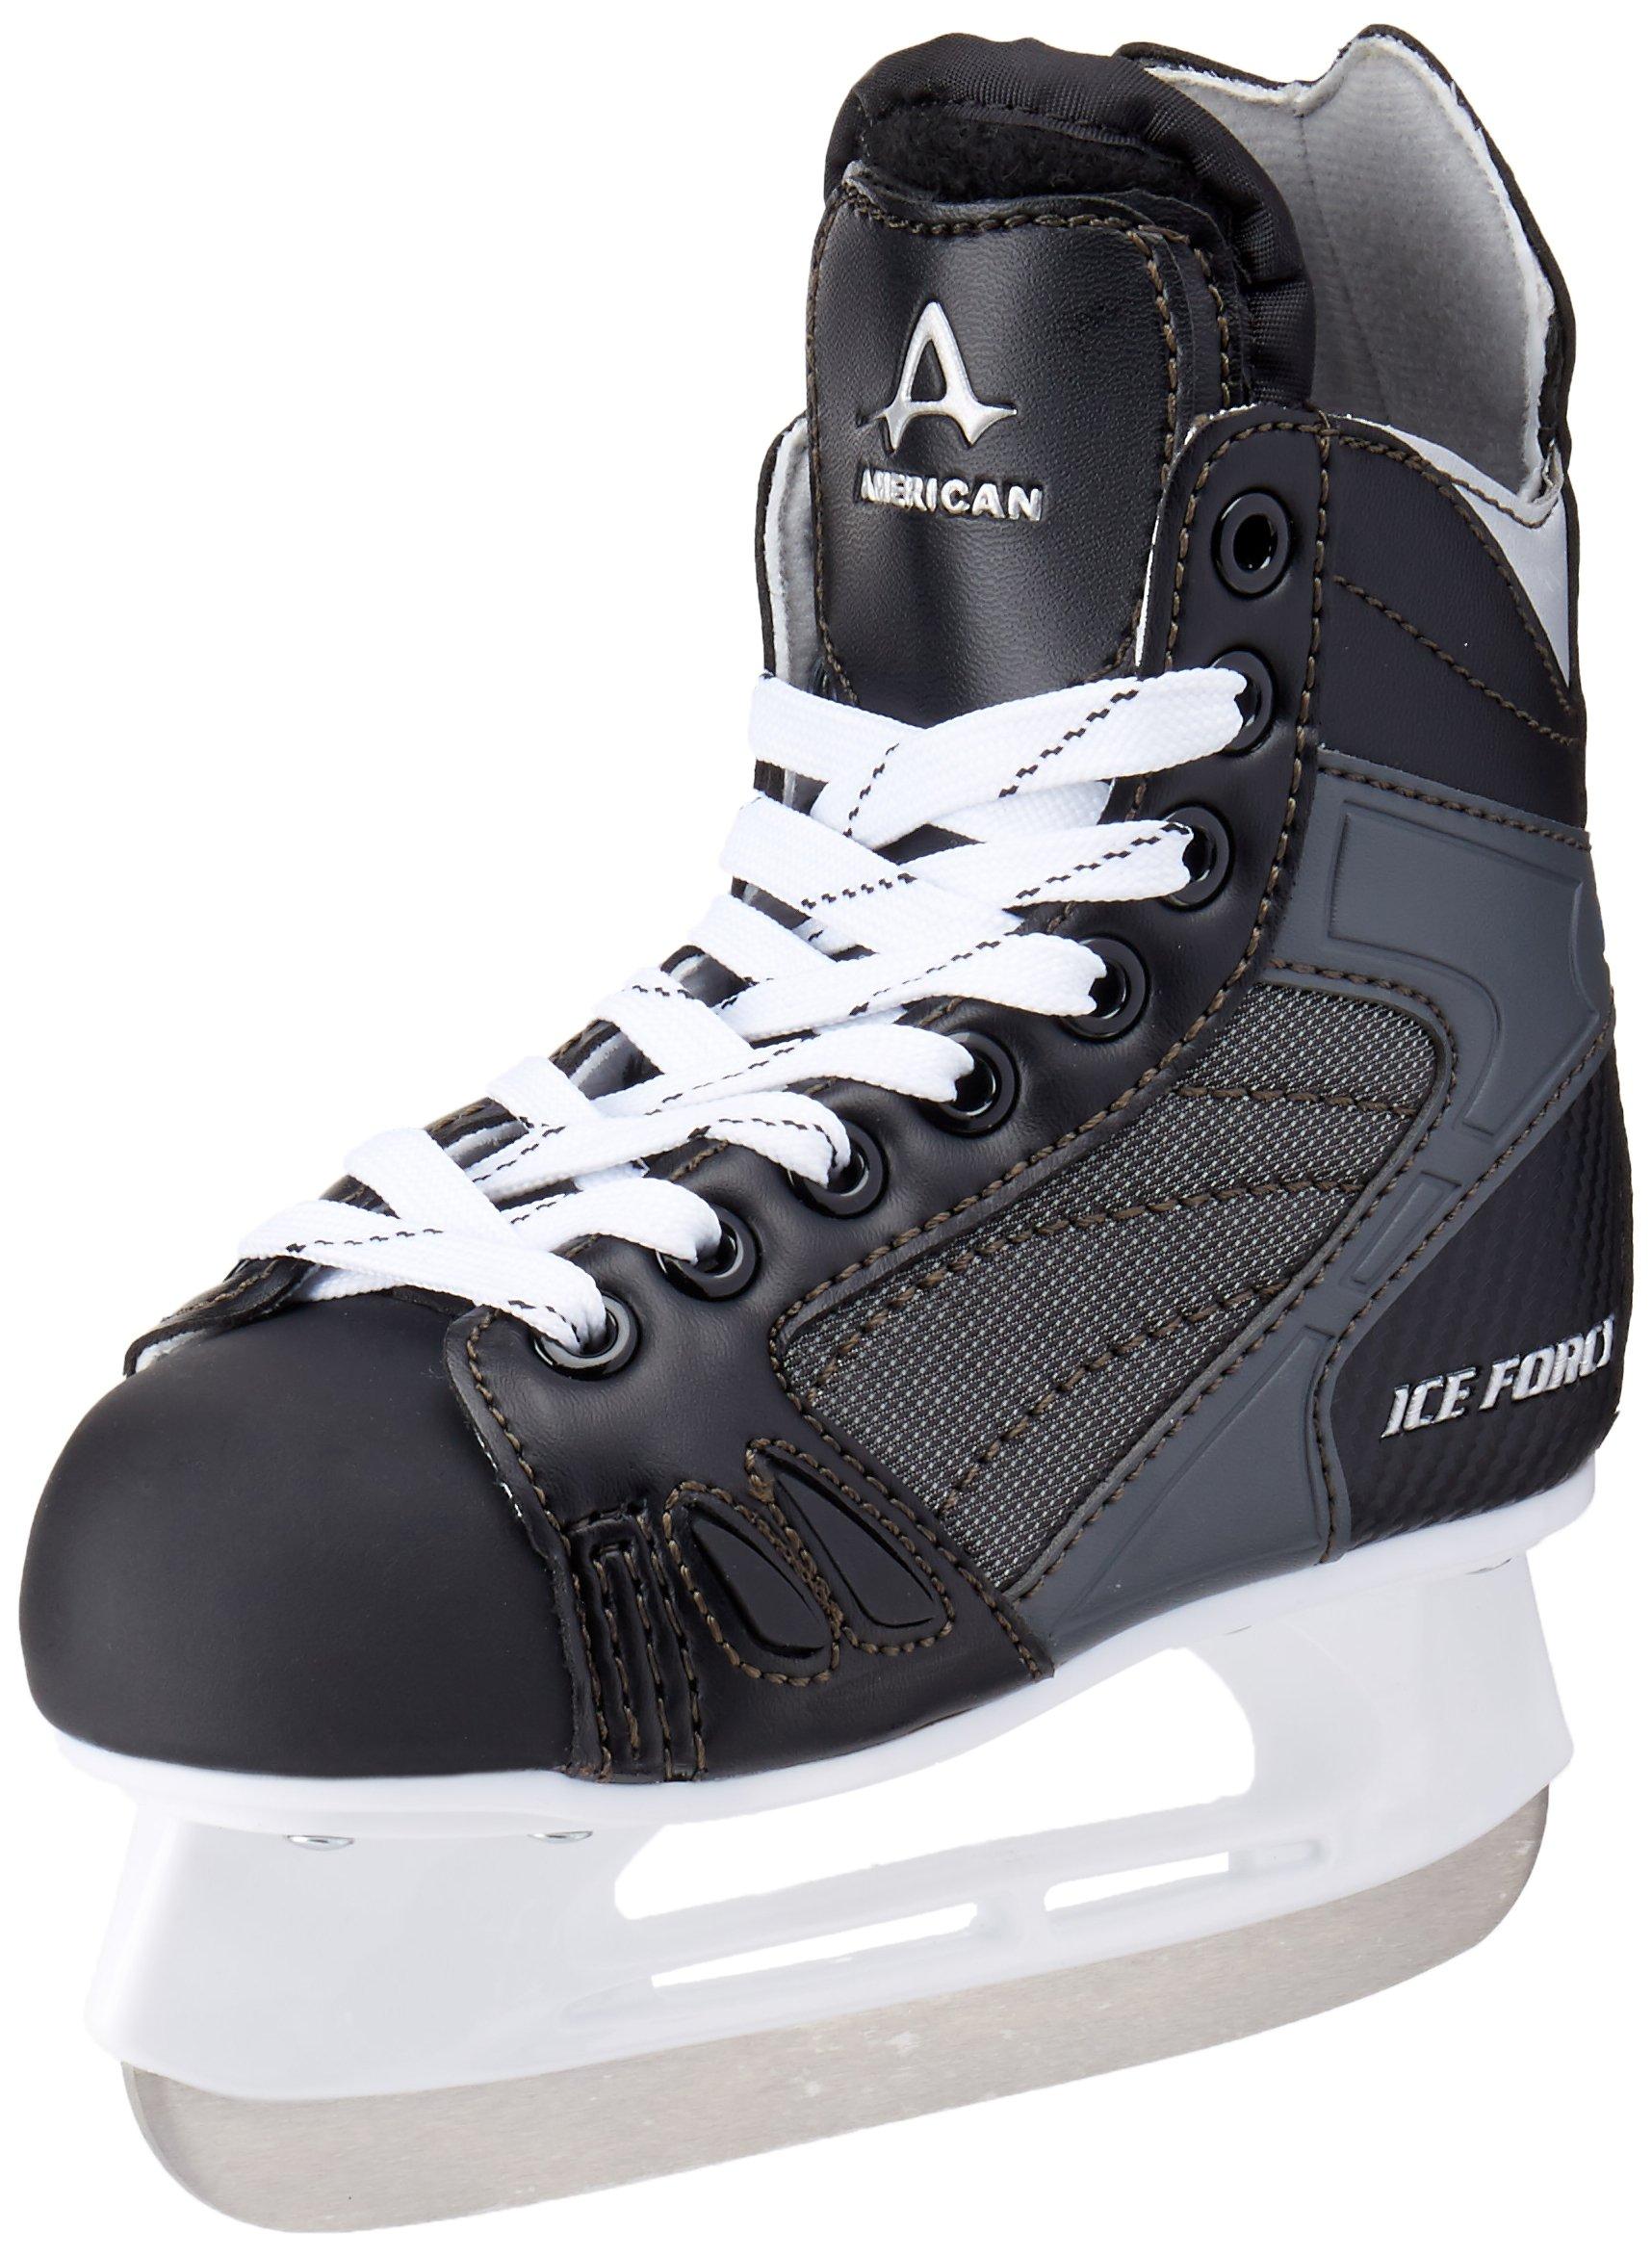 American Athletic Shoe Boy's Ice Force Hockey Skates, Black, 9 Y